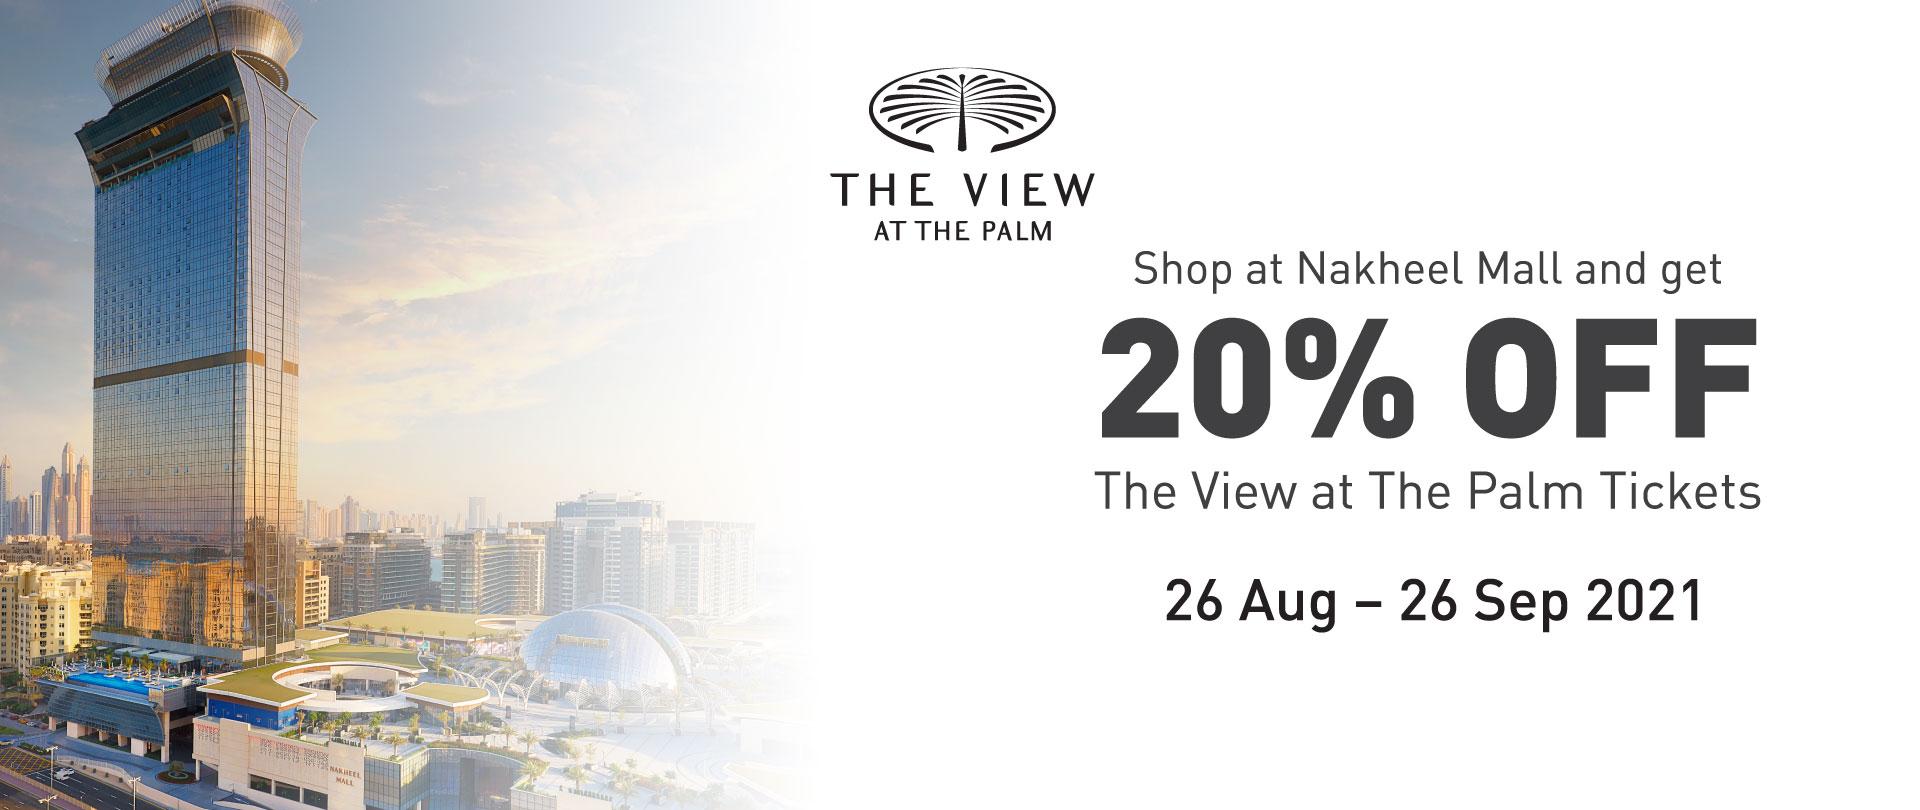 Nakheel Mall Cross Promotion